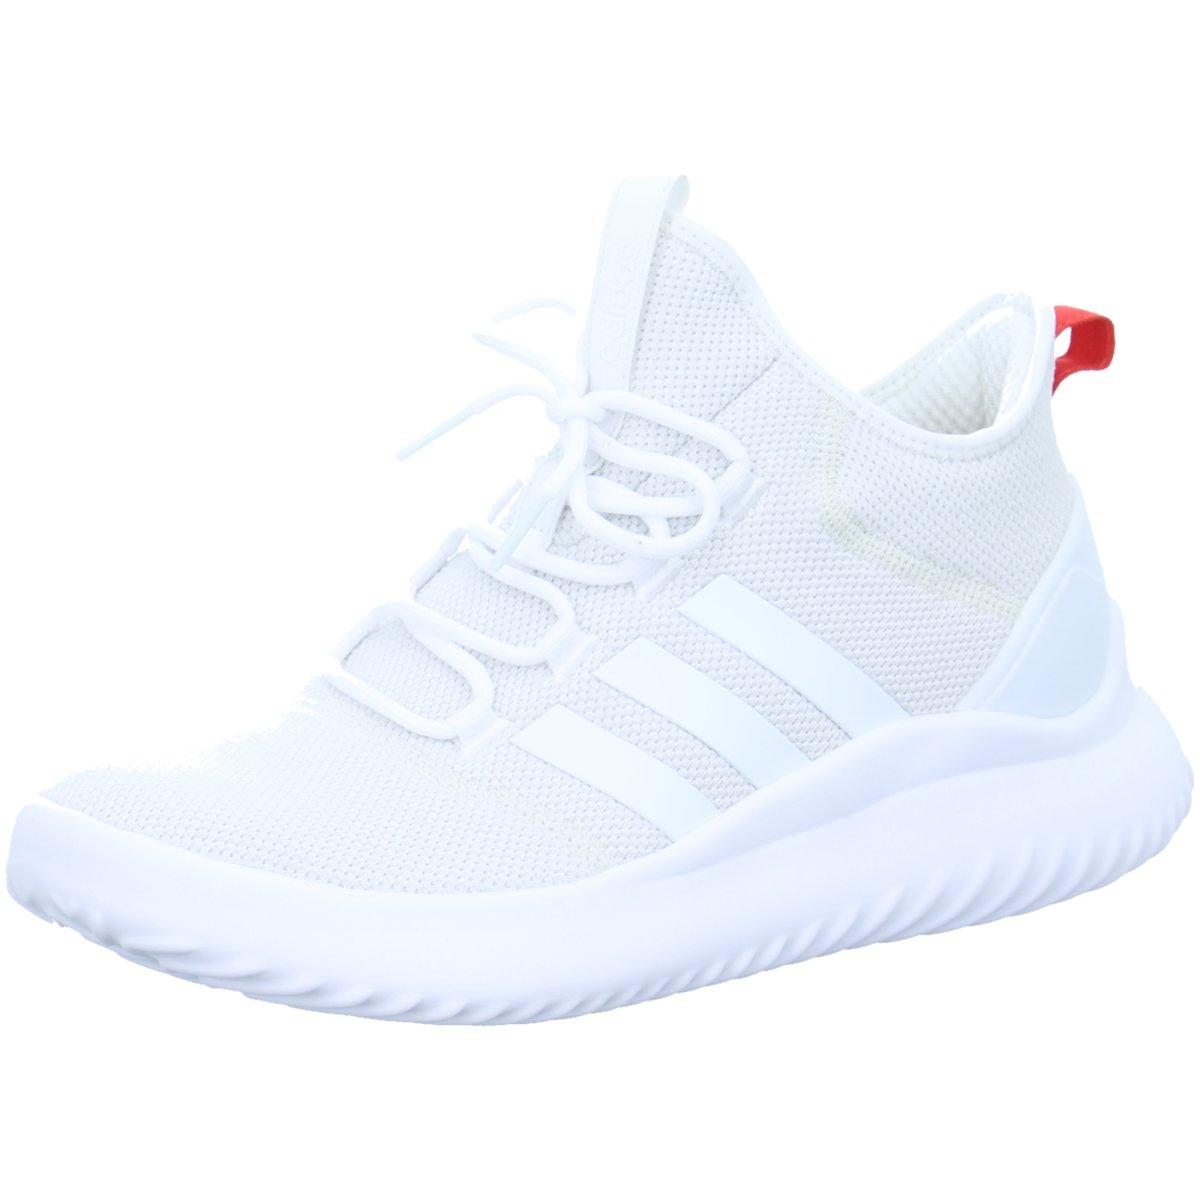 NEU adidas Herren Sneaker CF ULTIMATE BBALL Herren Sneaker DA9654 weiß 383888